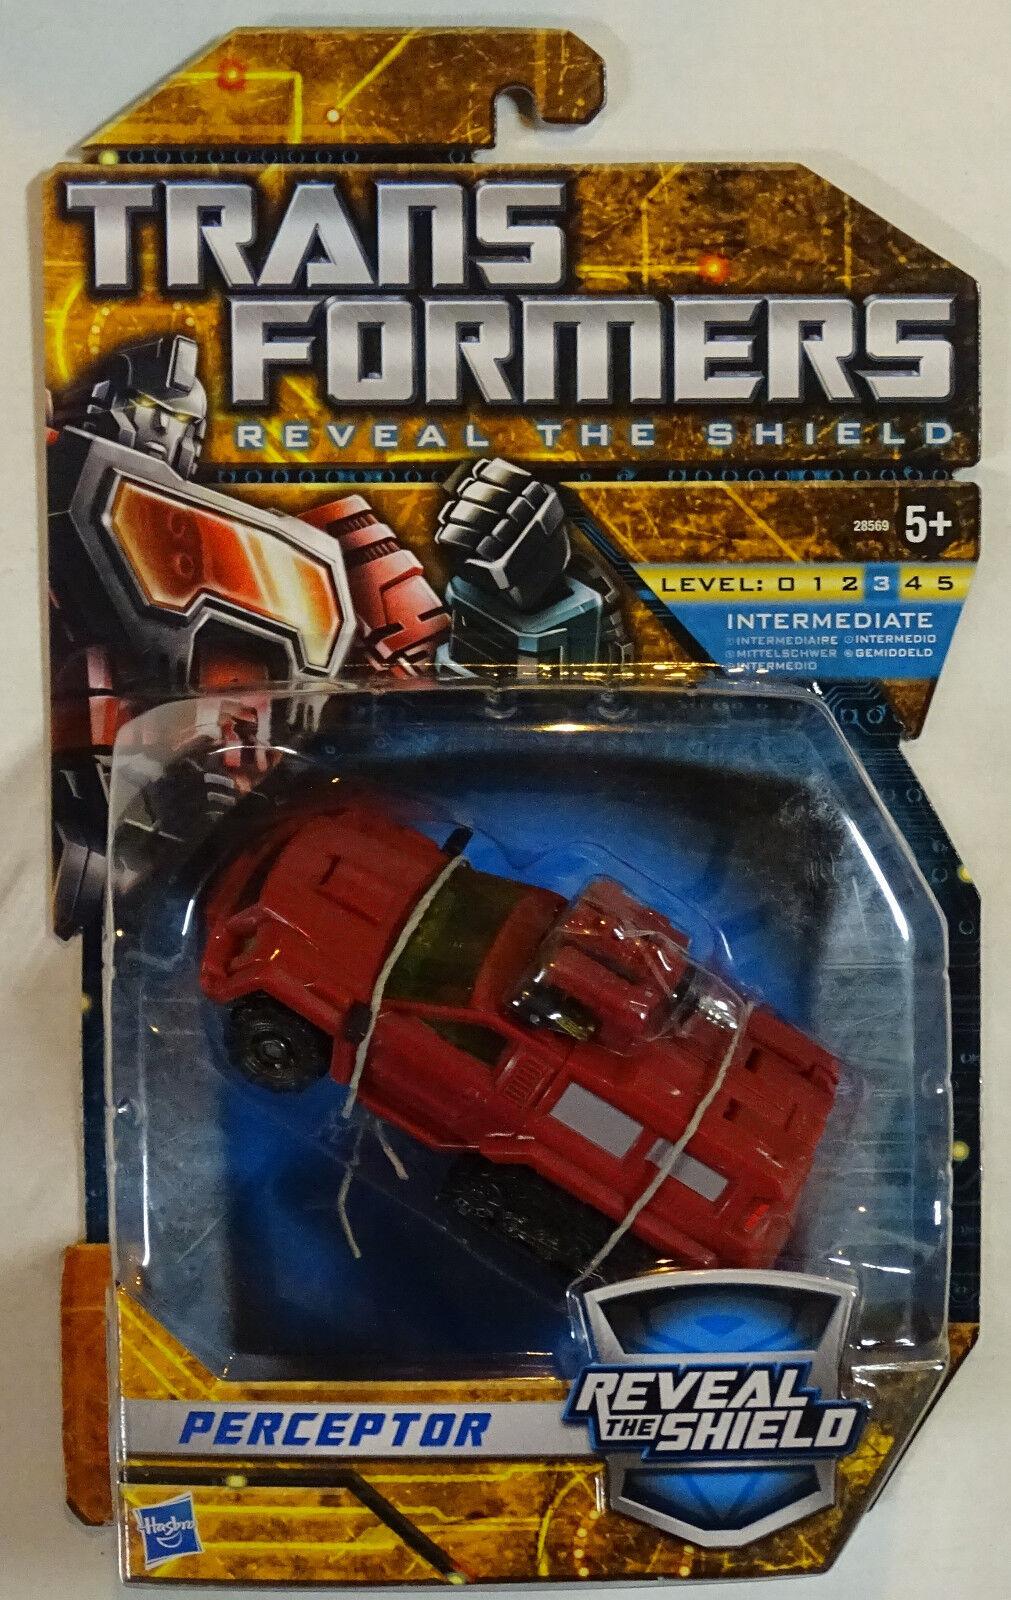 Hasbro  28569 Transformers Revenge of the Fallen Deluxe perceptor